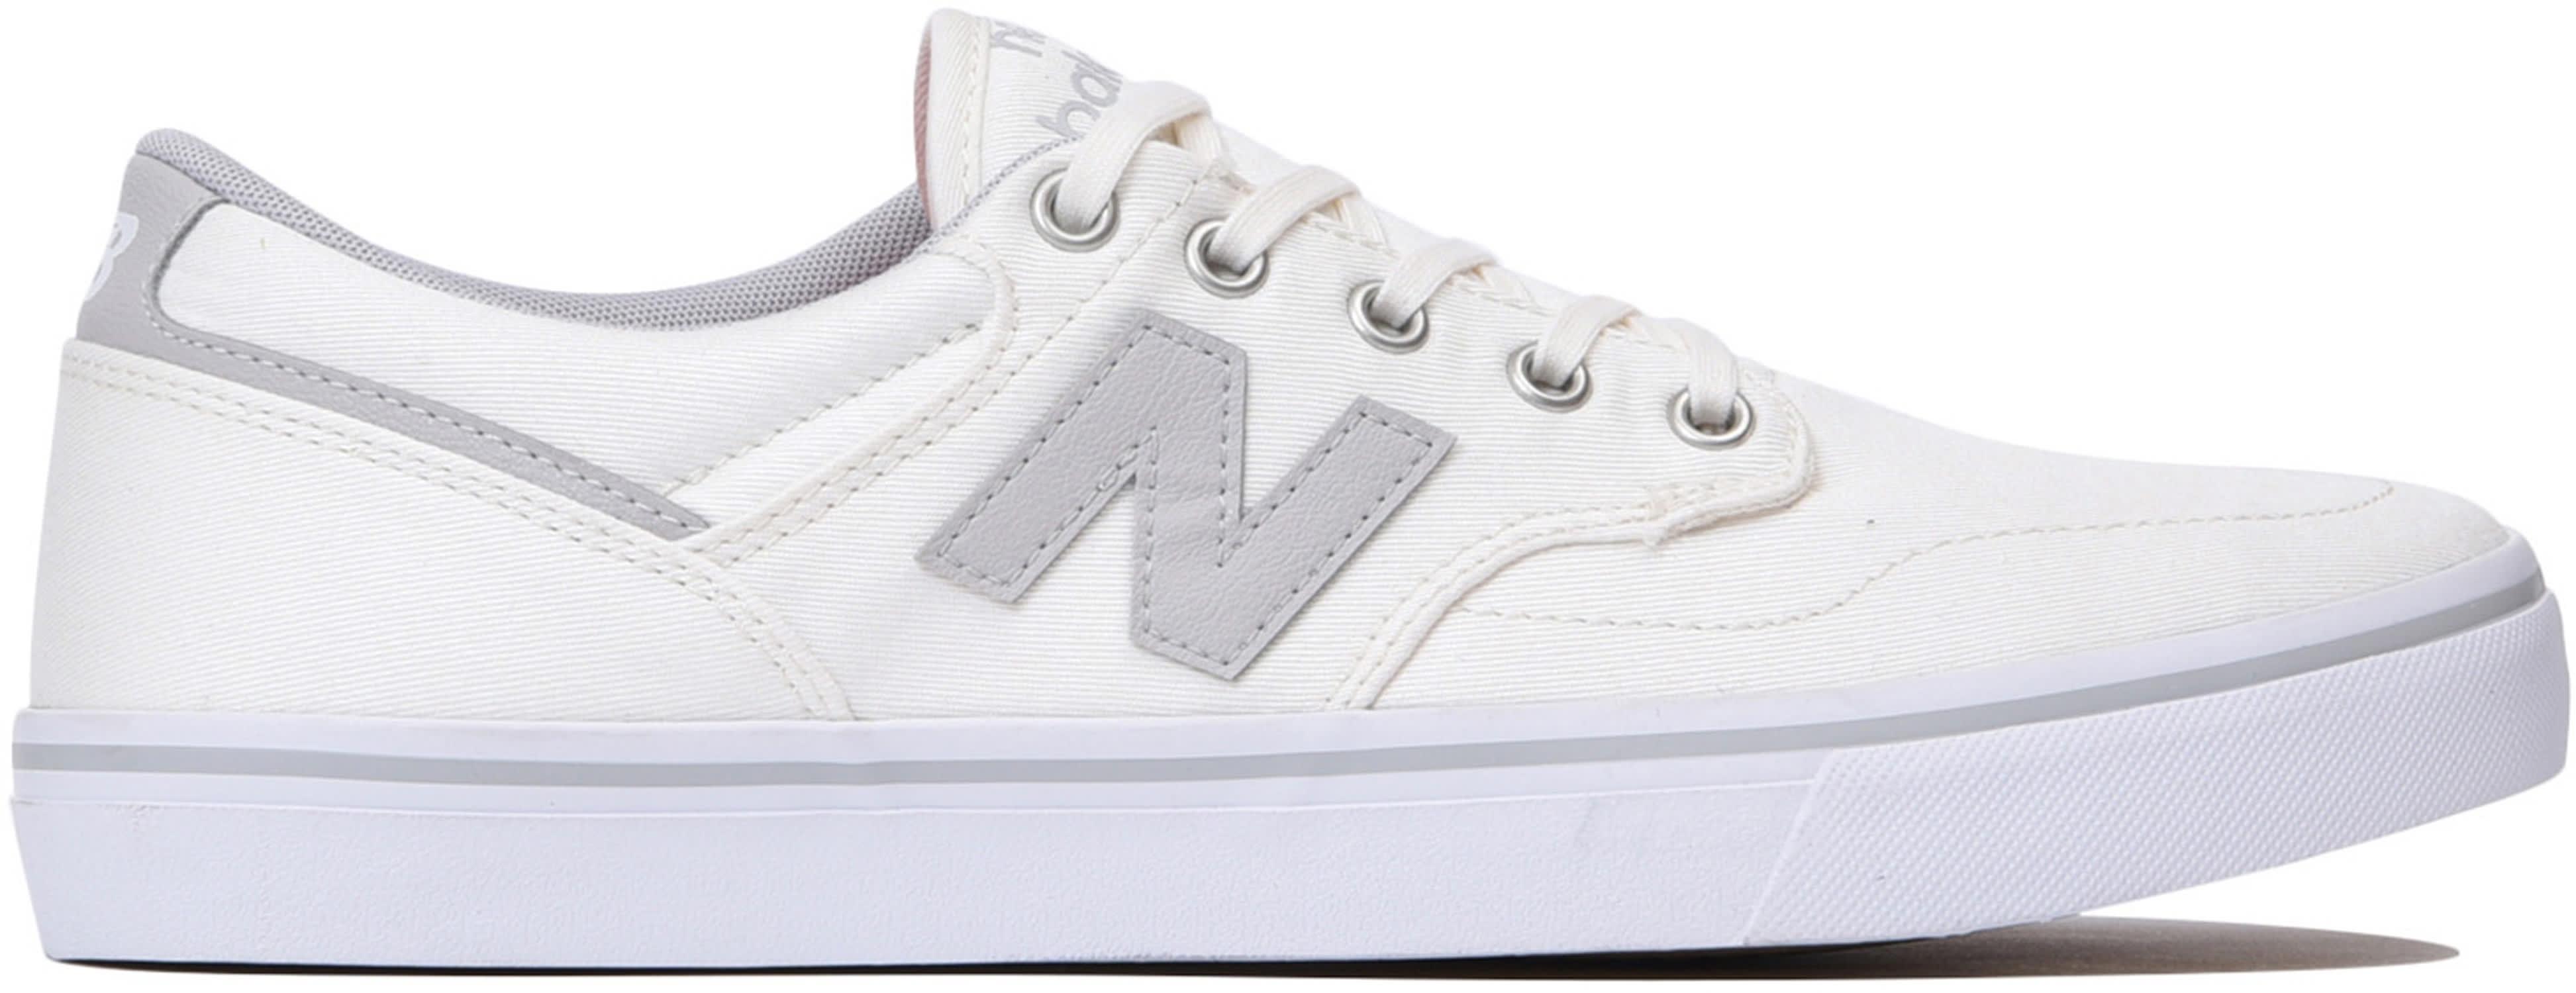 New Balance 331 Long Beach Skate Shoes